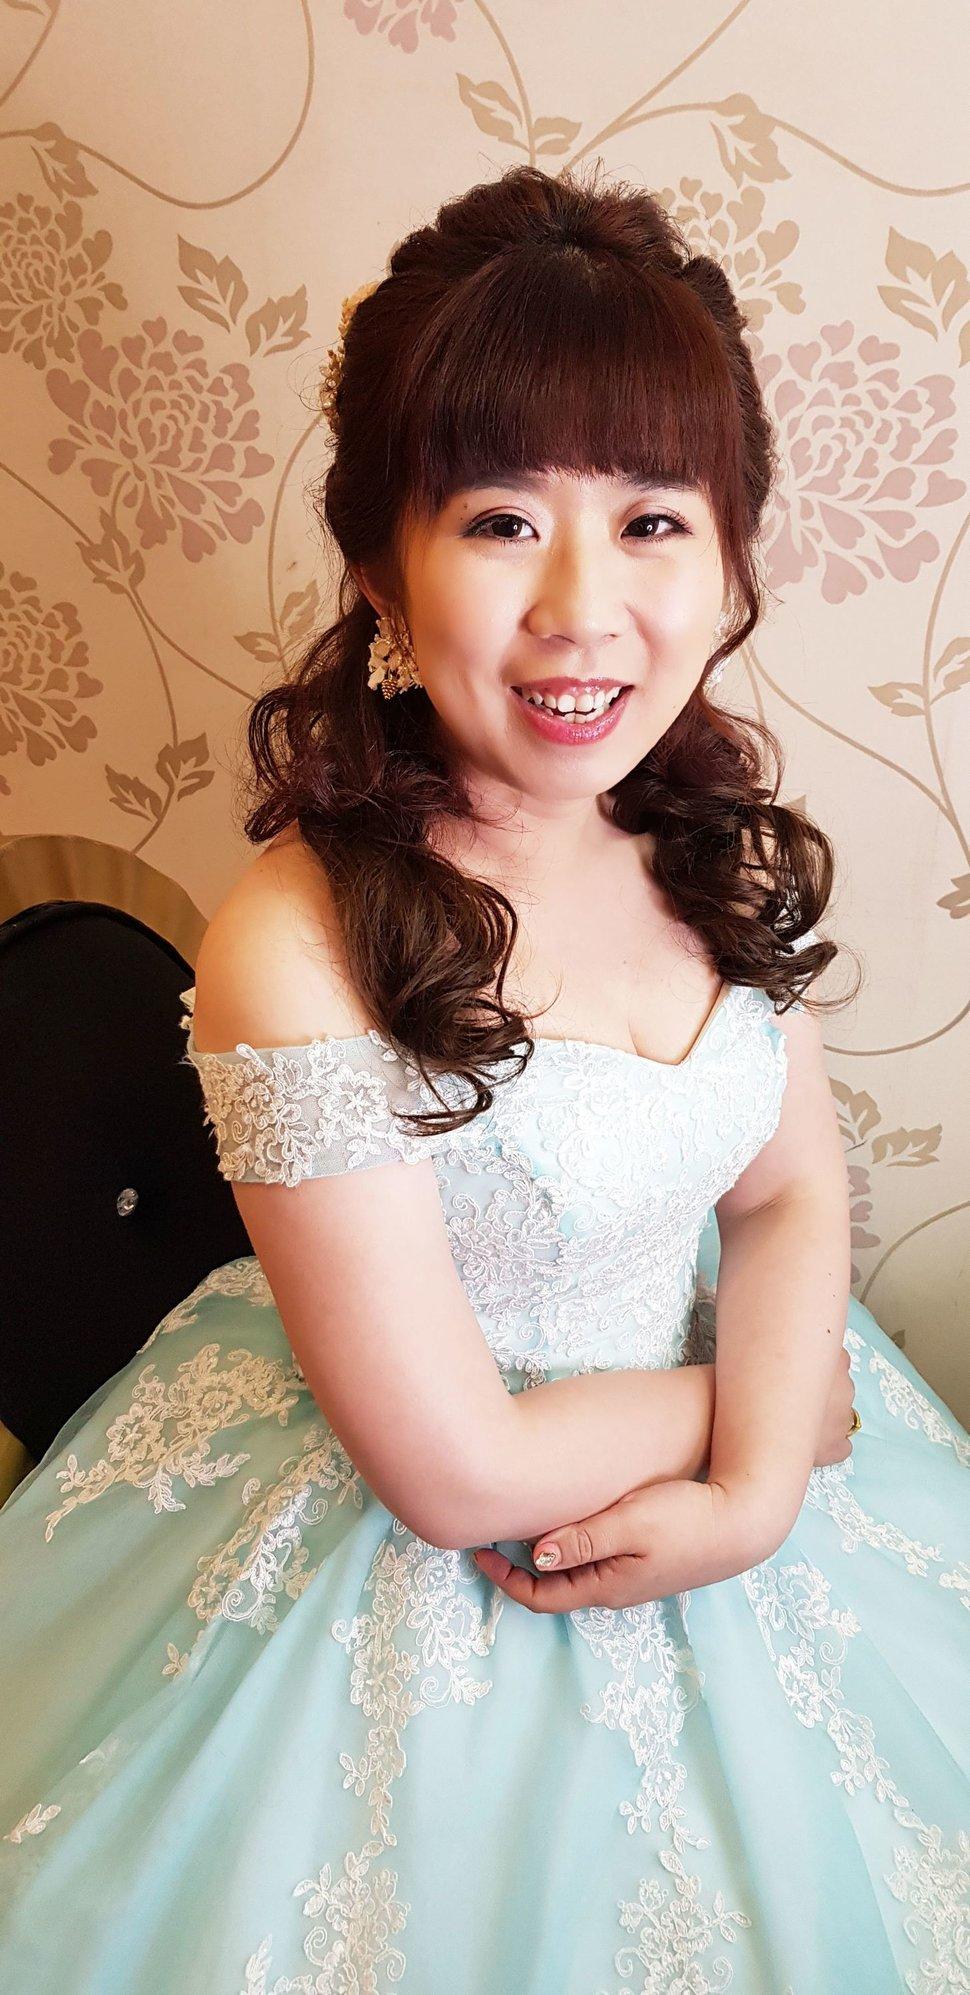 PSFix_20191012_134613 - 漾時尚婚禮整體造型總監蘇蓉蓉《結婚吧》